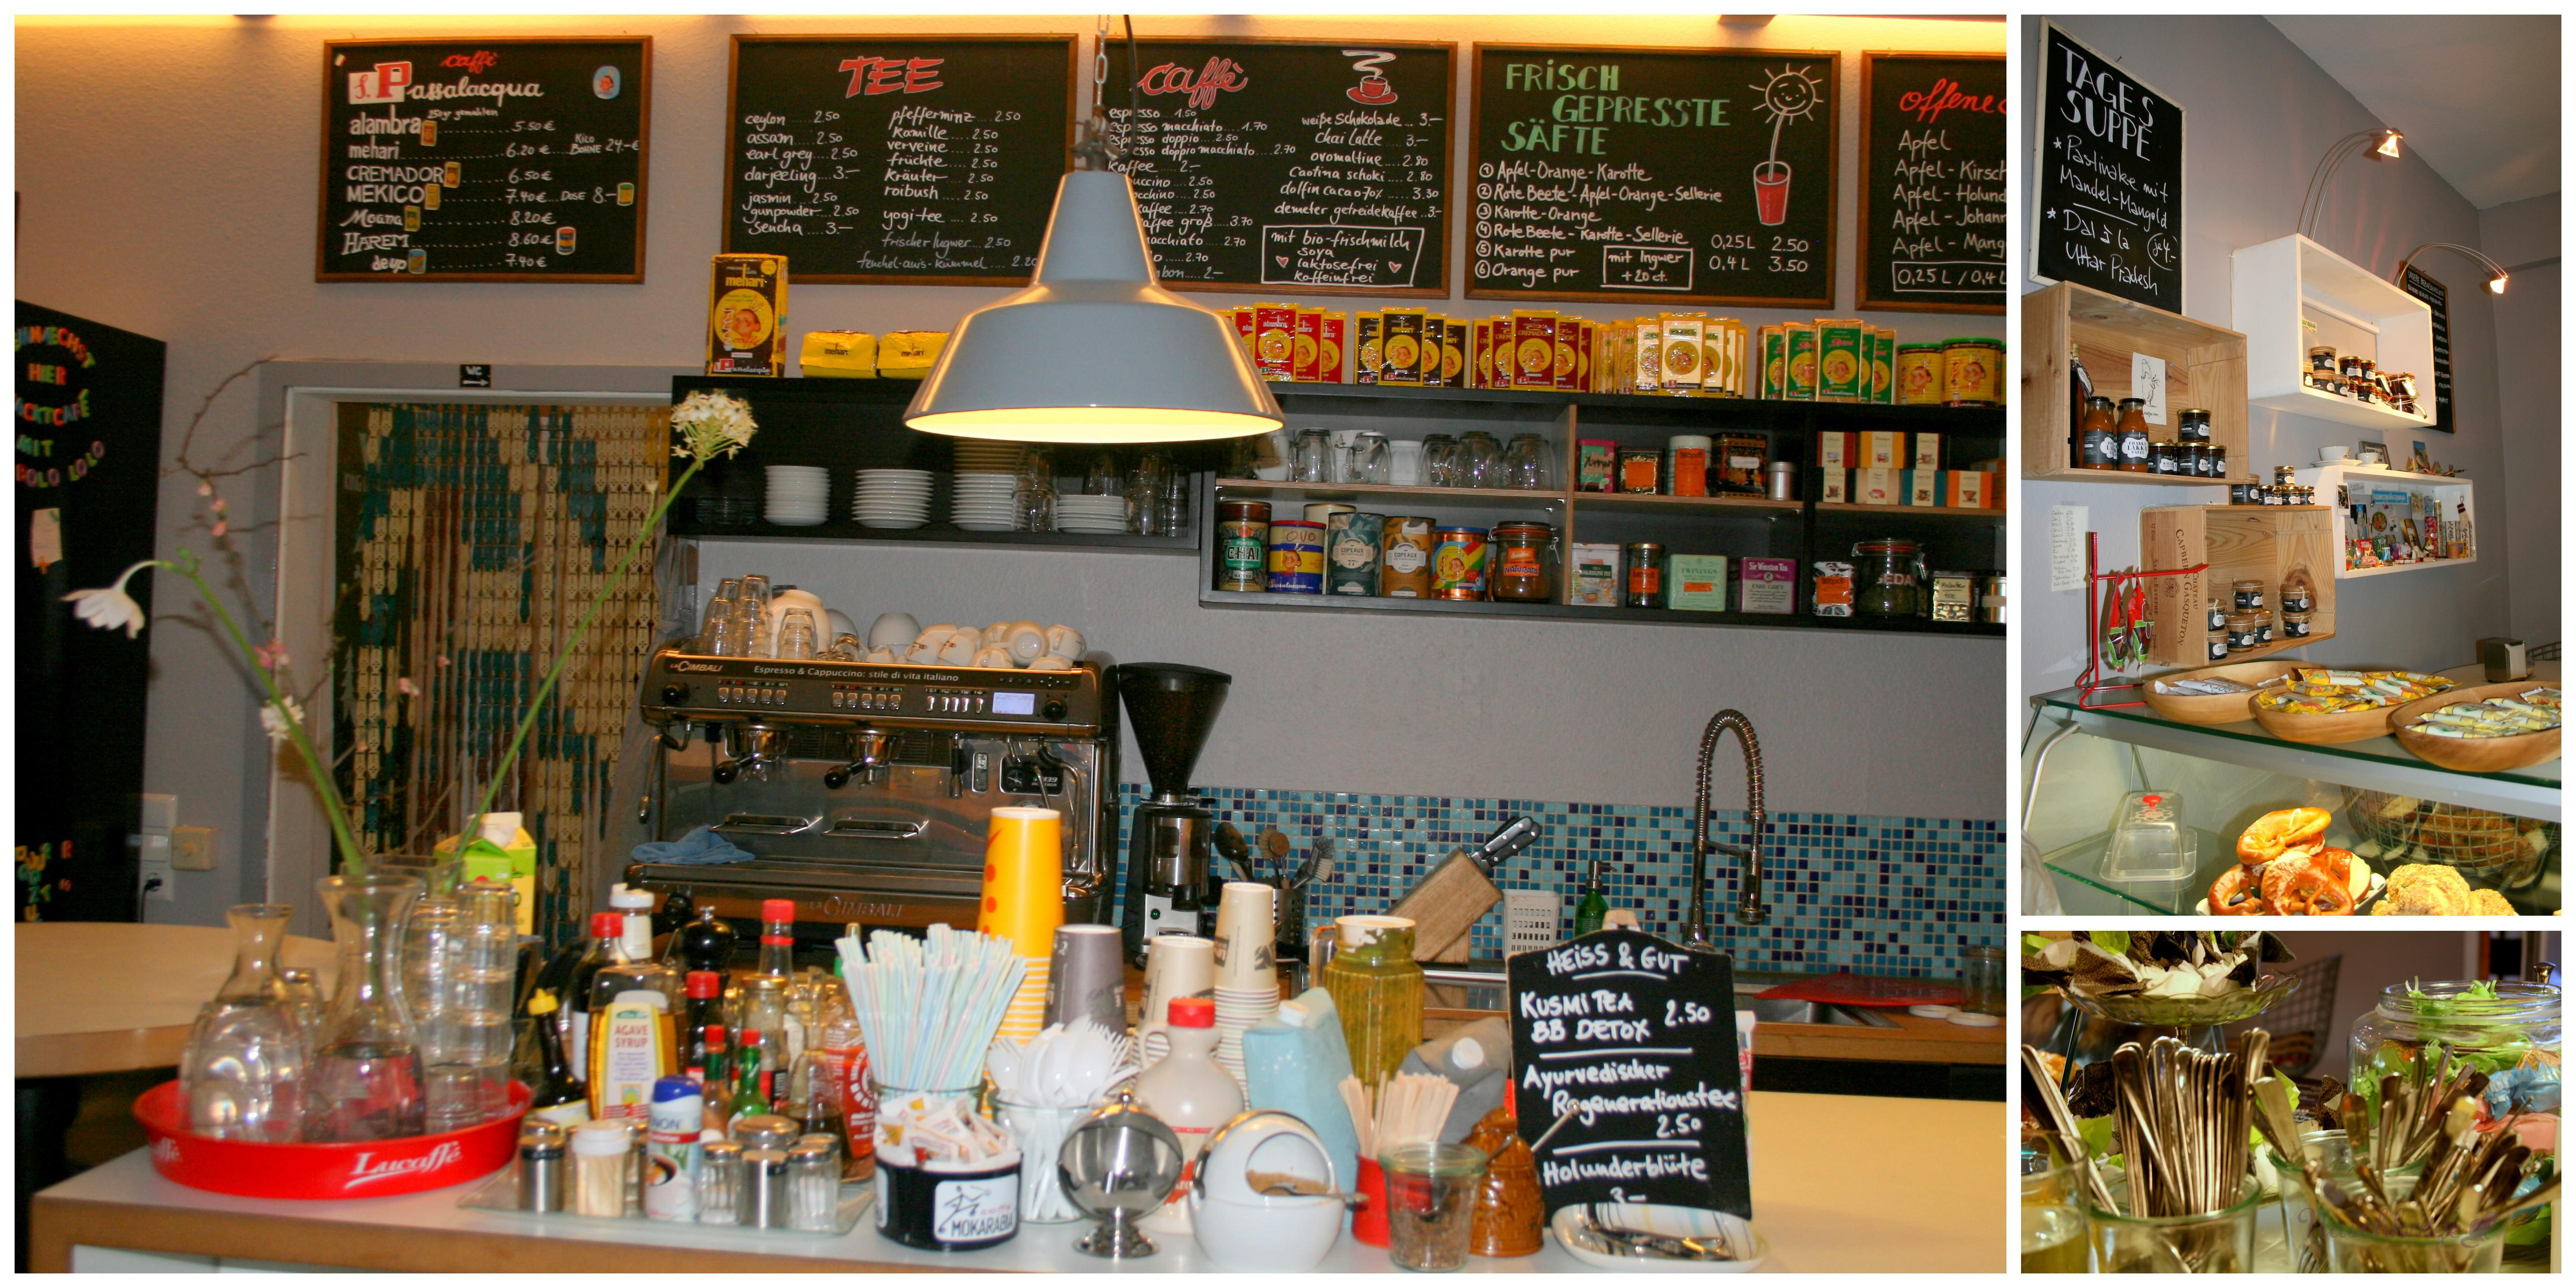 sedan-café-freiburg2.jpg - Freiburg Omas Küche